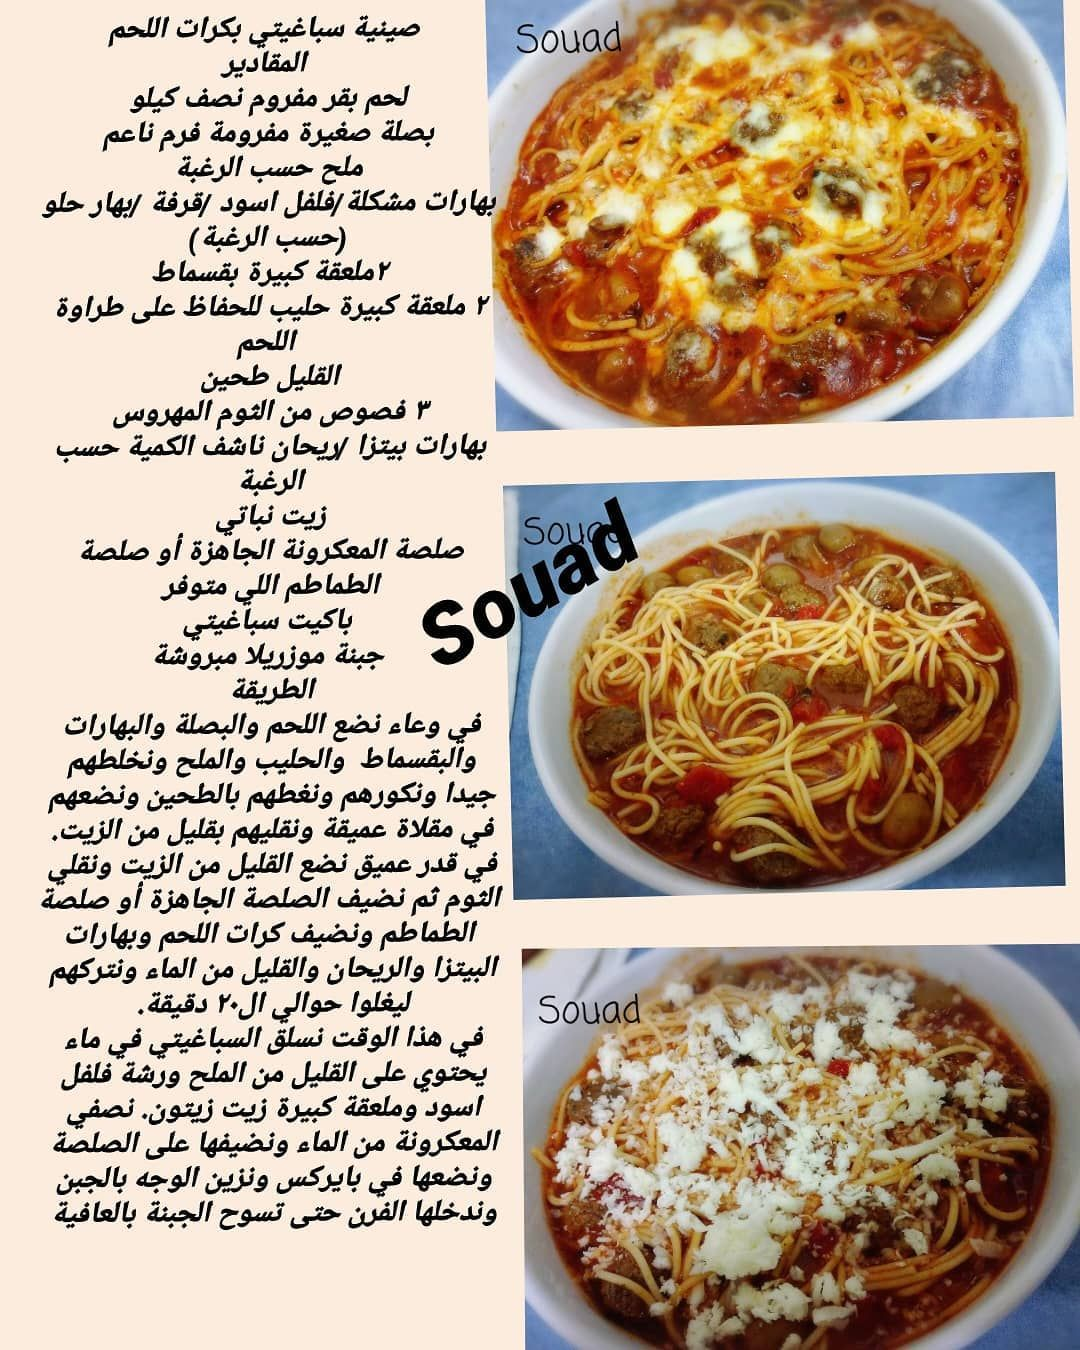 6 Likes 0 Comments Souad Hosna Souadhosna On Instagram بصينية سباغيتي بكرات اللحم سباغيتي طبخات مصوره طبخات لذيذة Cooking Recipes Cooking Recipes